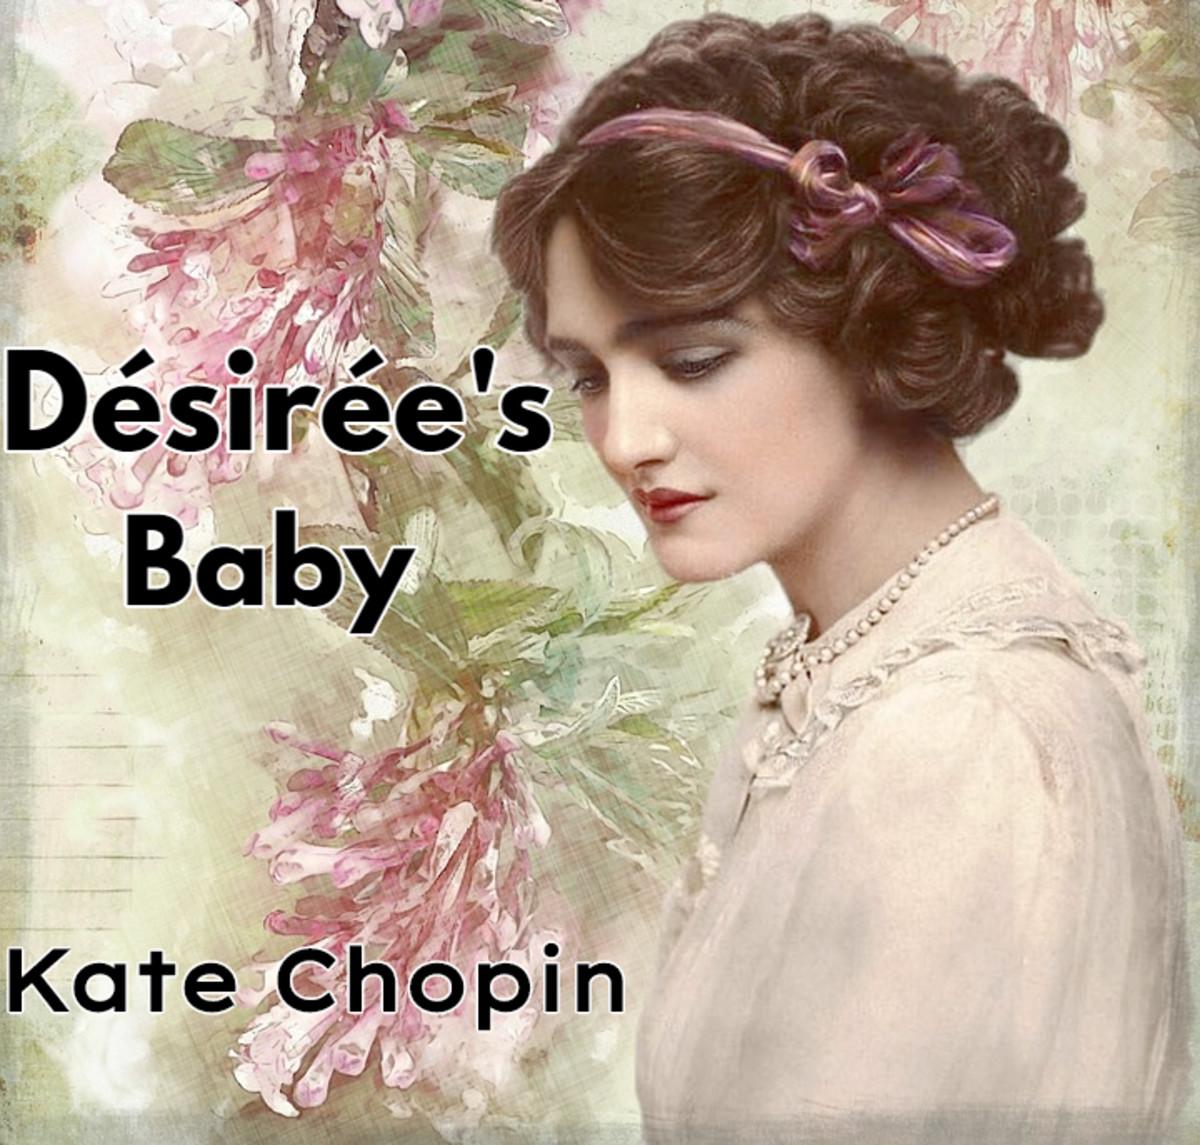 desiree-baby-summary-analysis-themes-kate-chopin